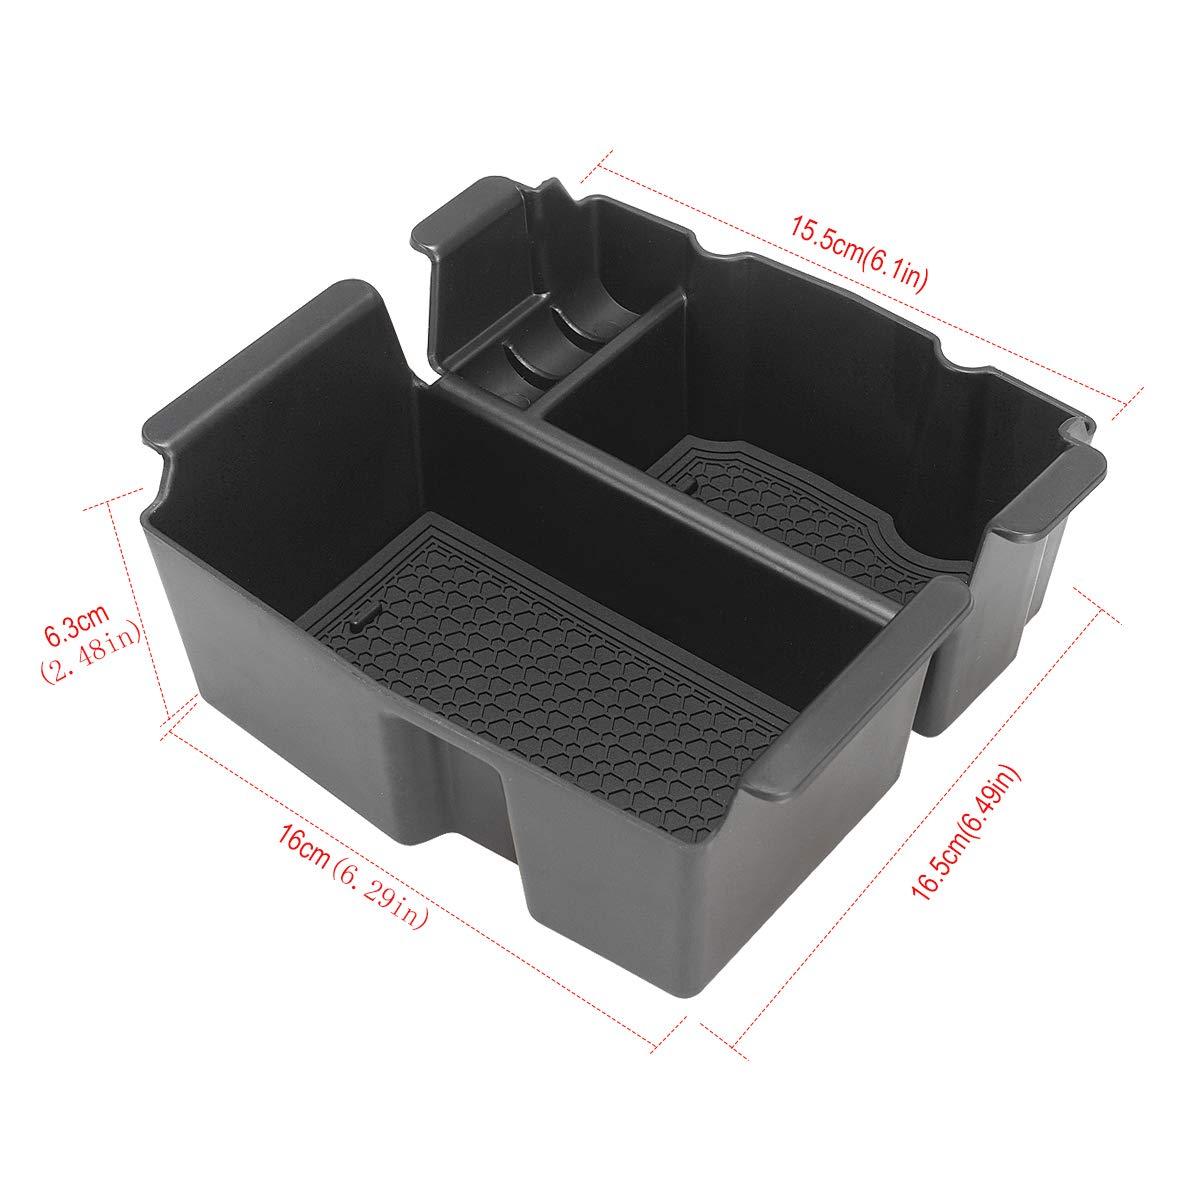 LITTOU Car Center Console Organizer Armrest Box Secondary Storage Box with Non-Slip Mat Compatible for Wrangler JL 2018 2019